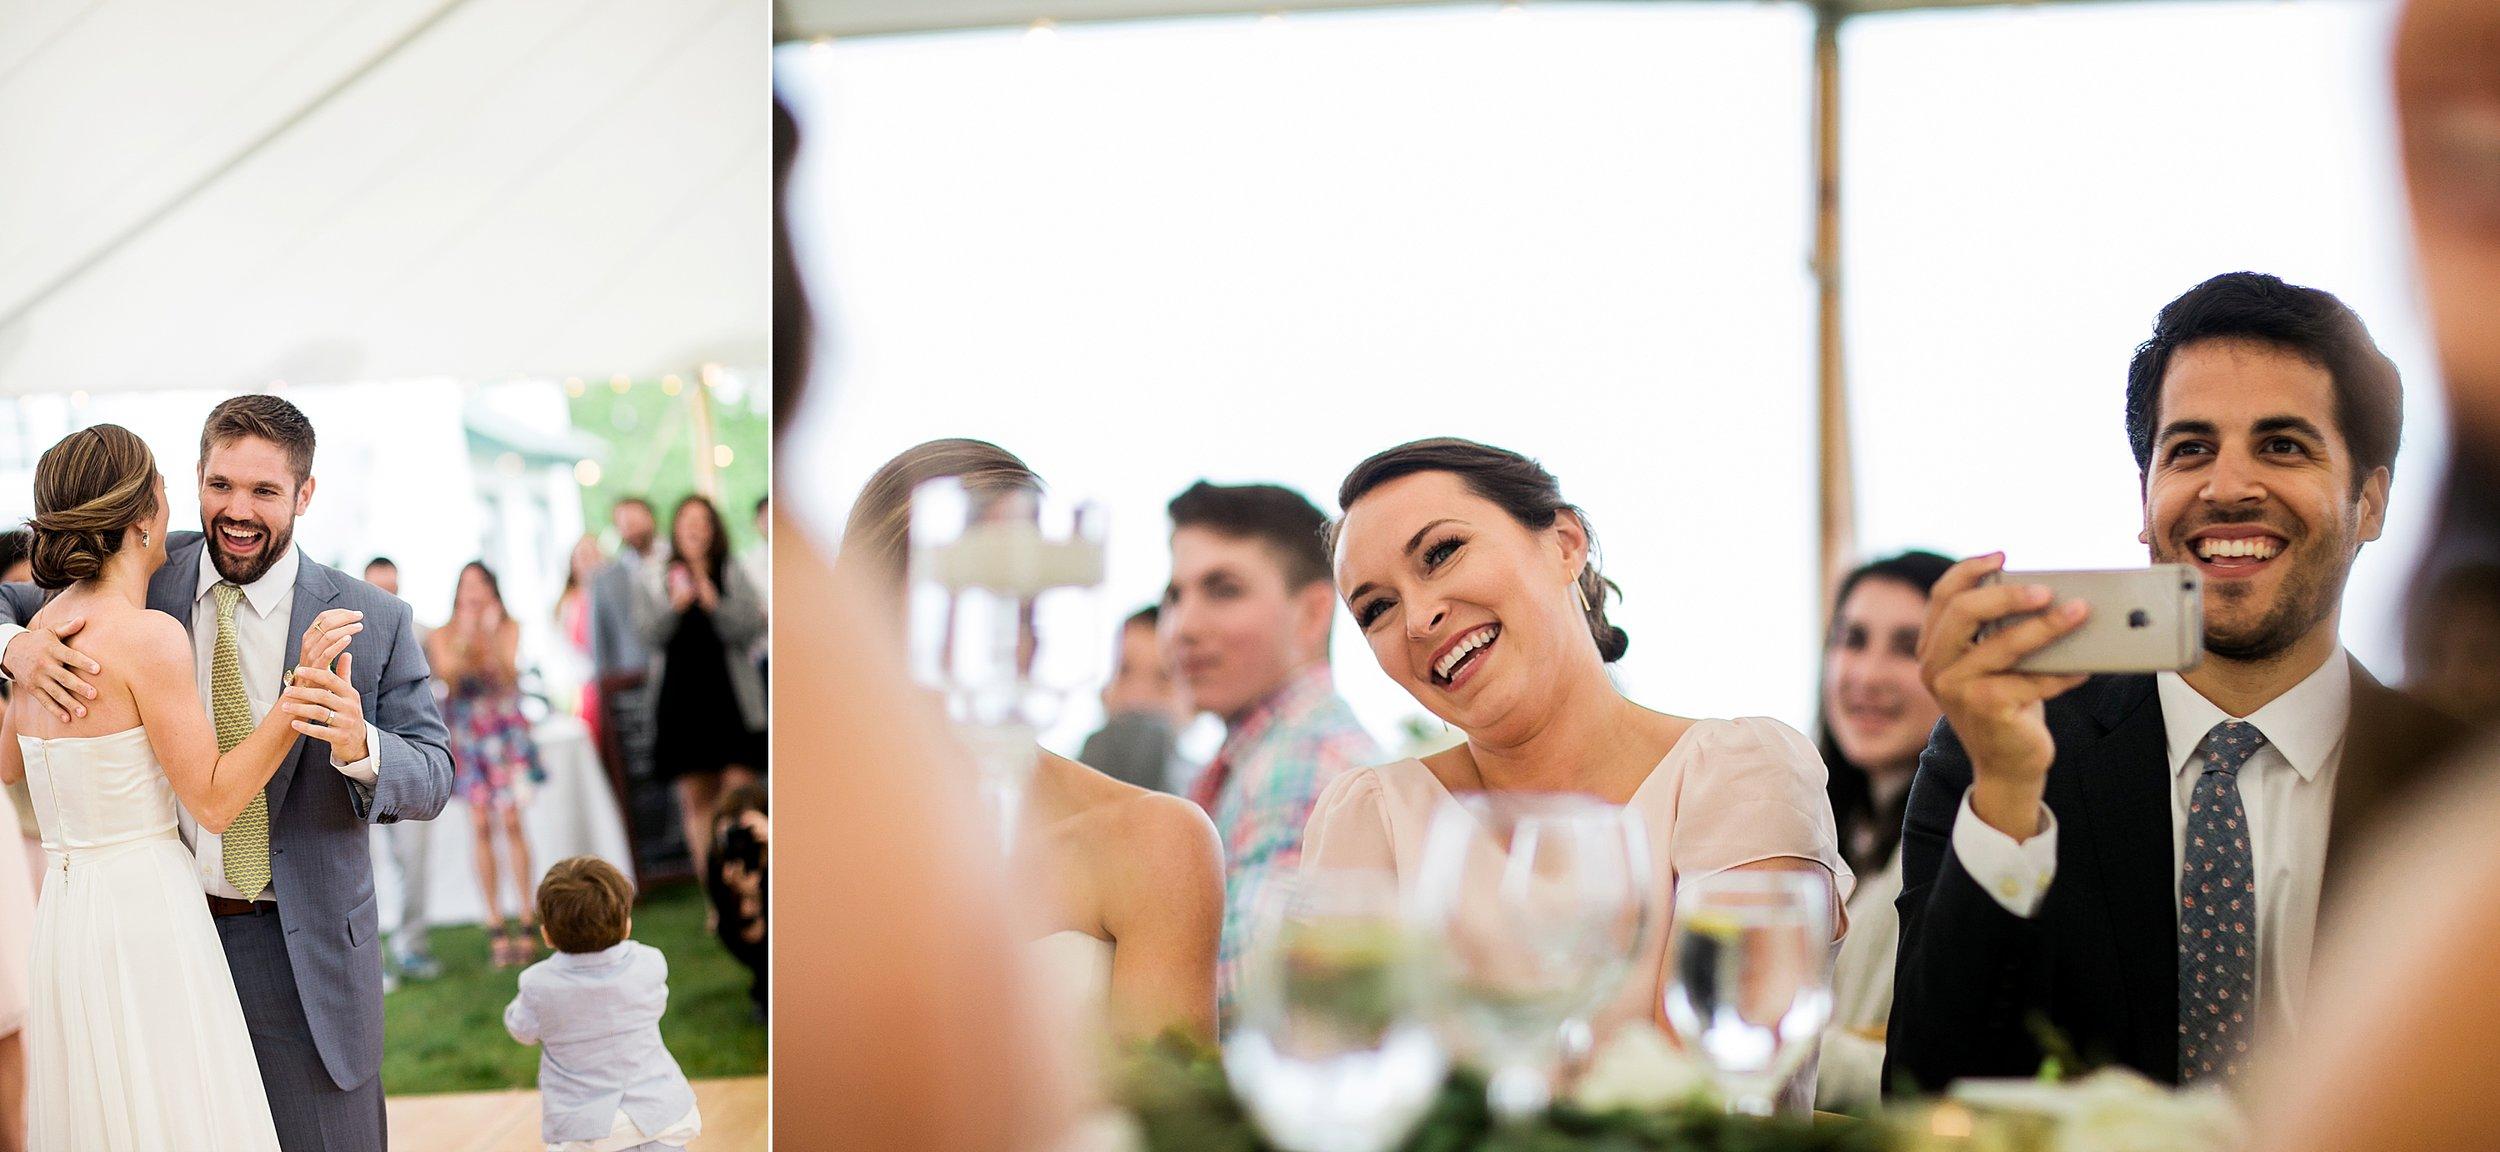 056 los angeles wedding photographer todd danforth photography cape cod.jpg